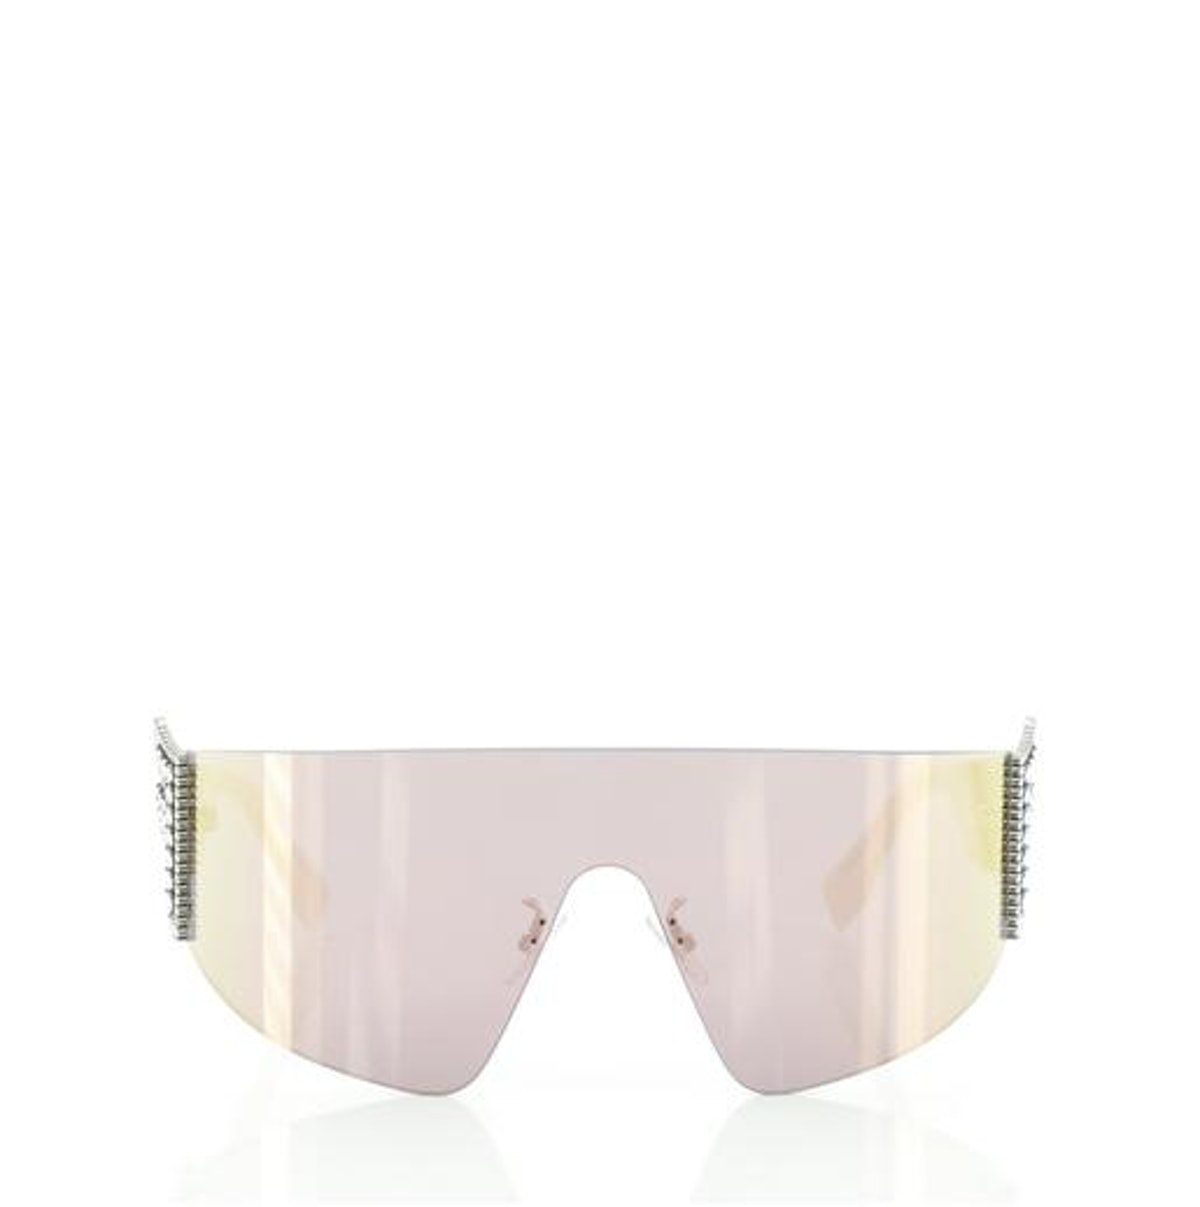 Fendi FFreedom Shield Sunglasses Acetate with Crystal Embellished Metal